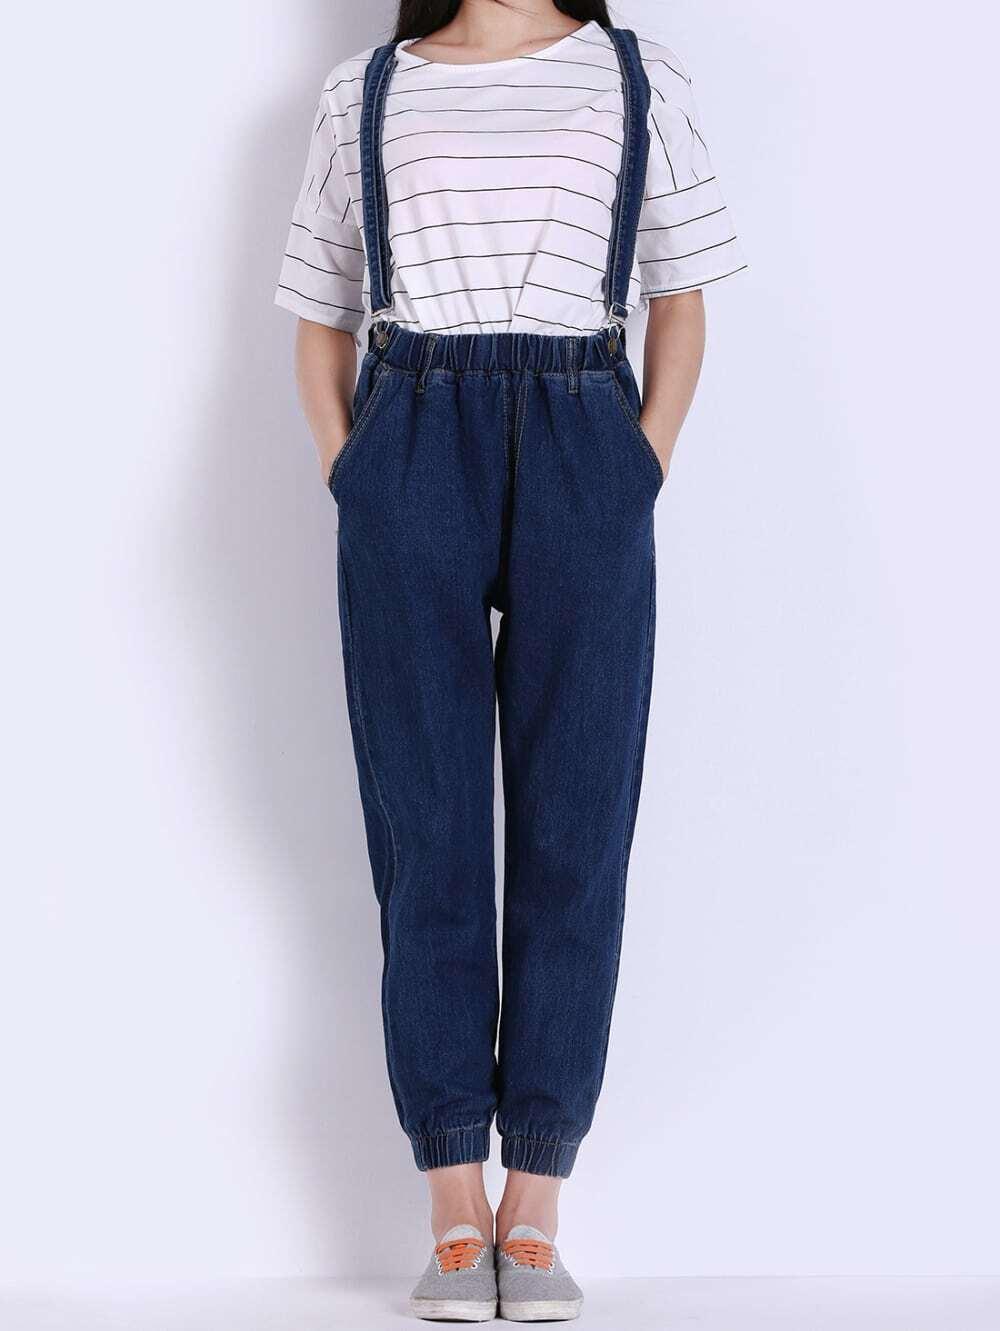 Strap Elastic Waist With Pockets Denim Jumpsuit